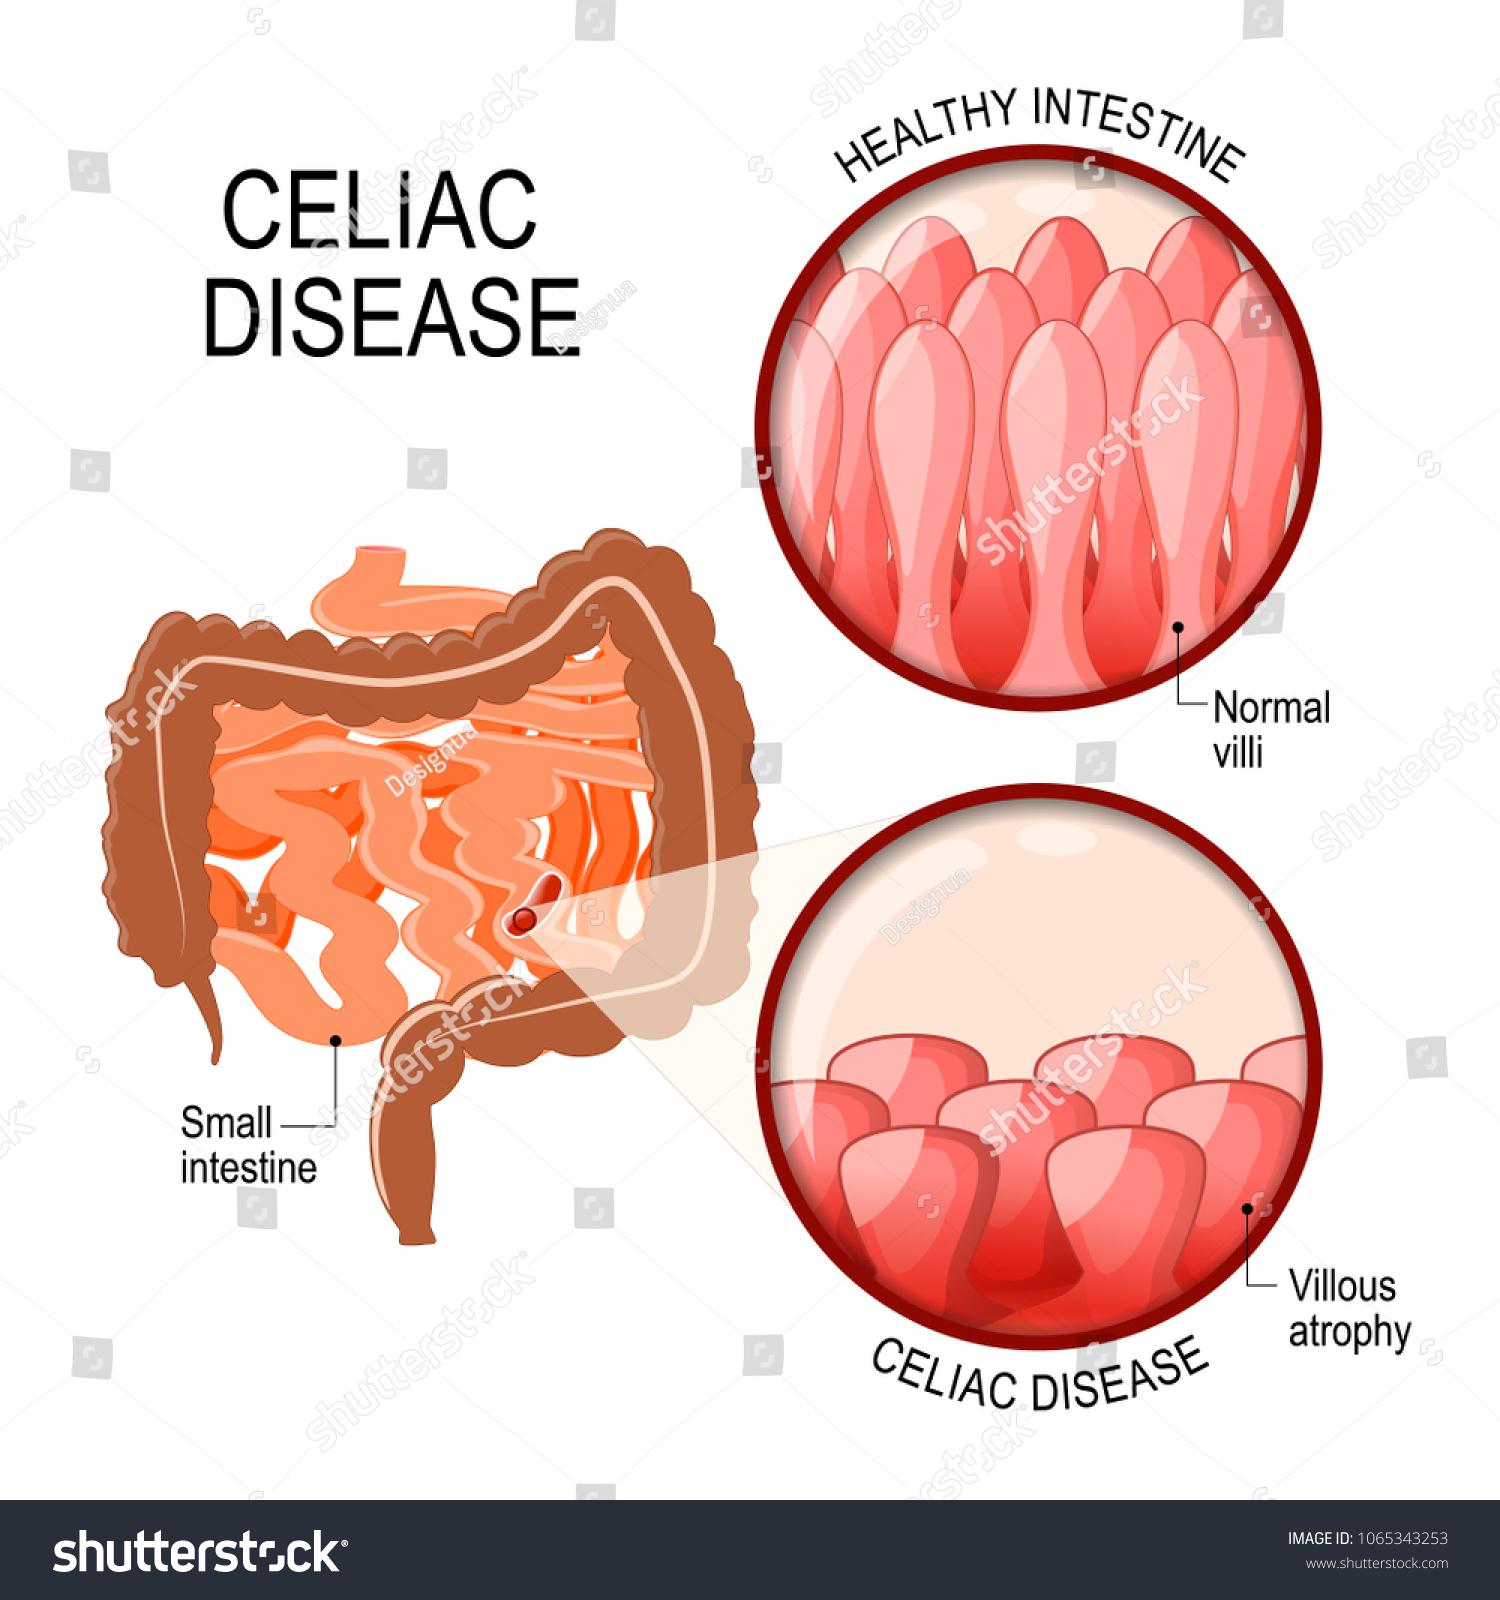 Celiac Disease Small Intestinal Normal Villi Stock Illustration